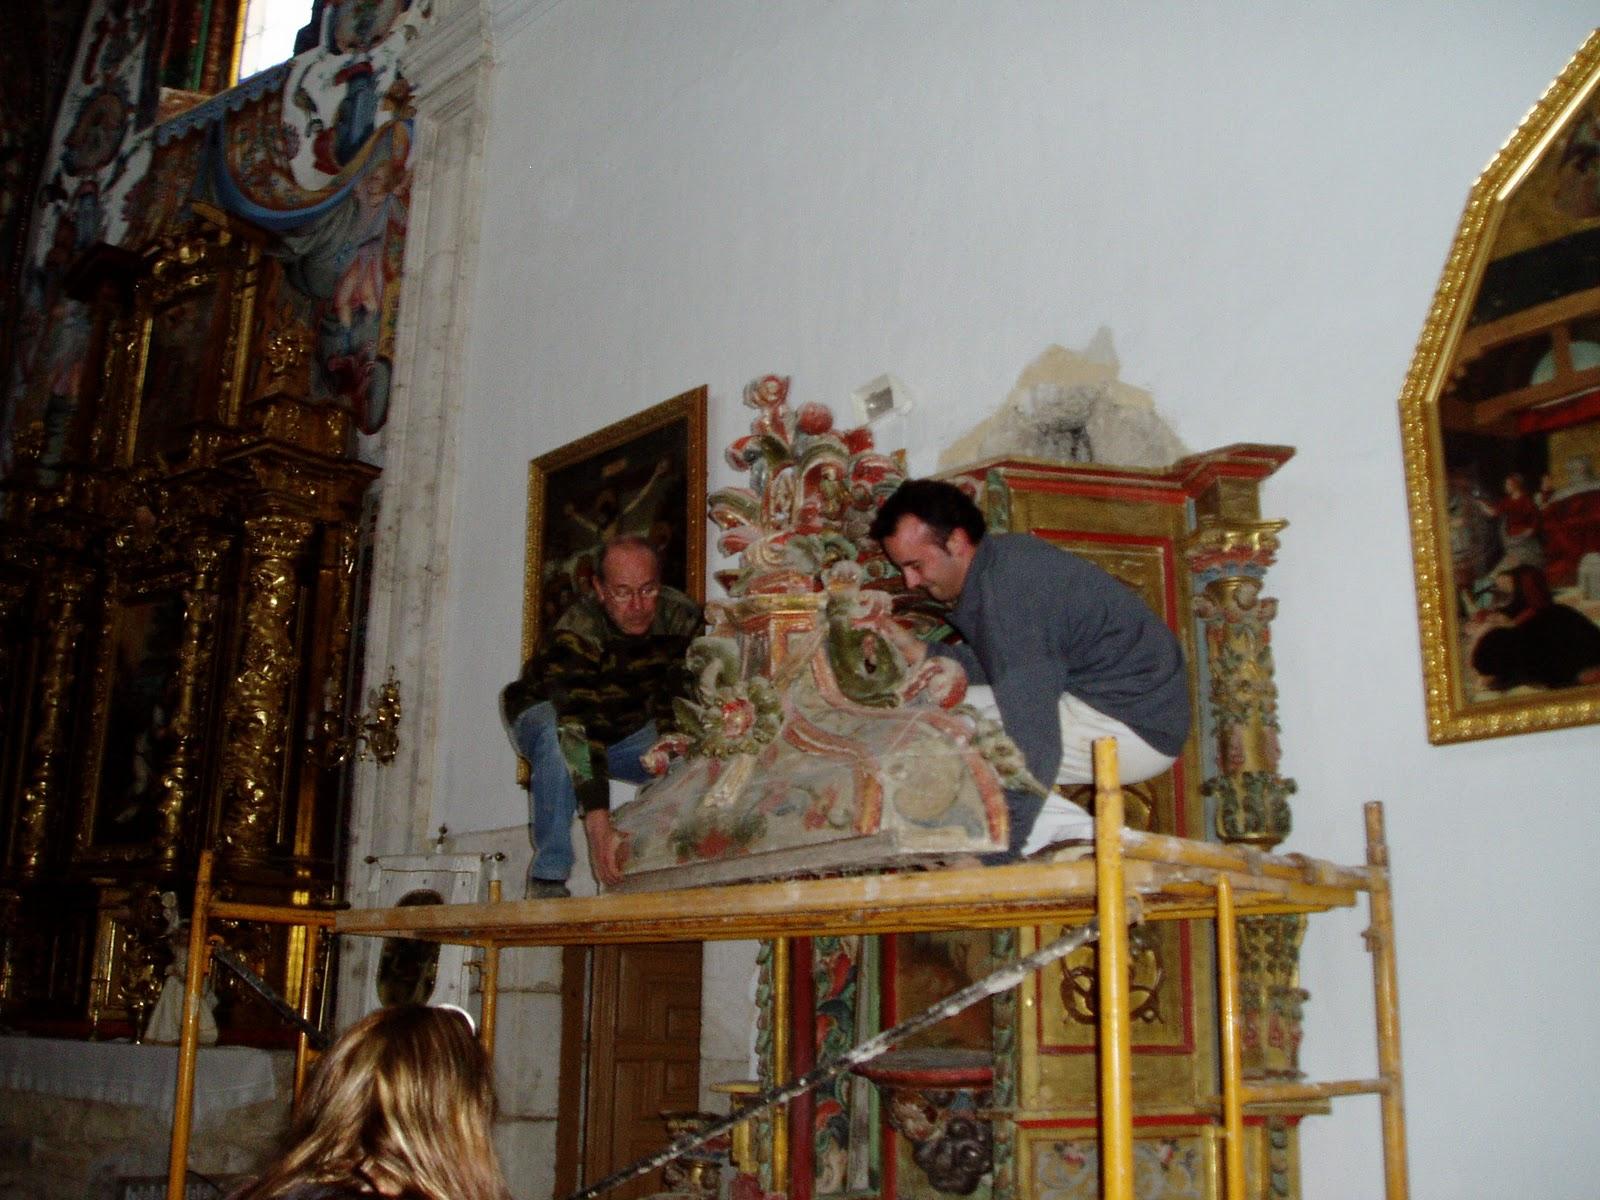 Fuentemolinosblog restaurando el altar de san sebasti n - Atico las tablas ...